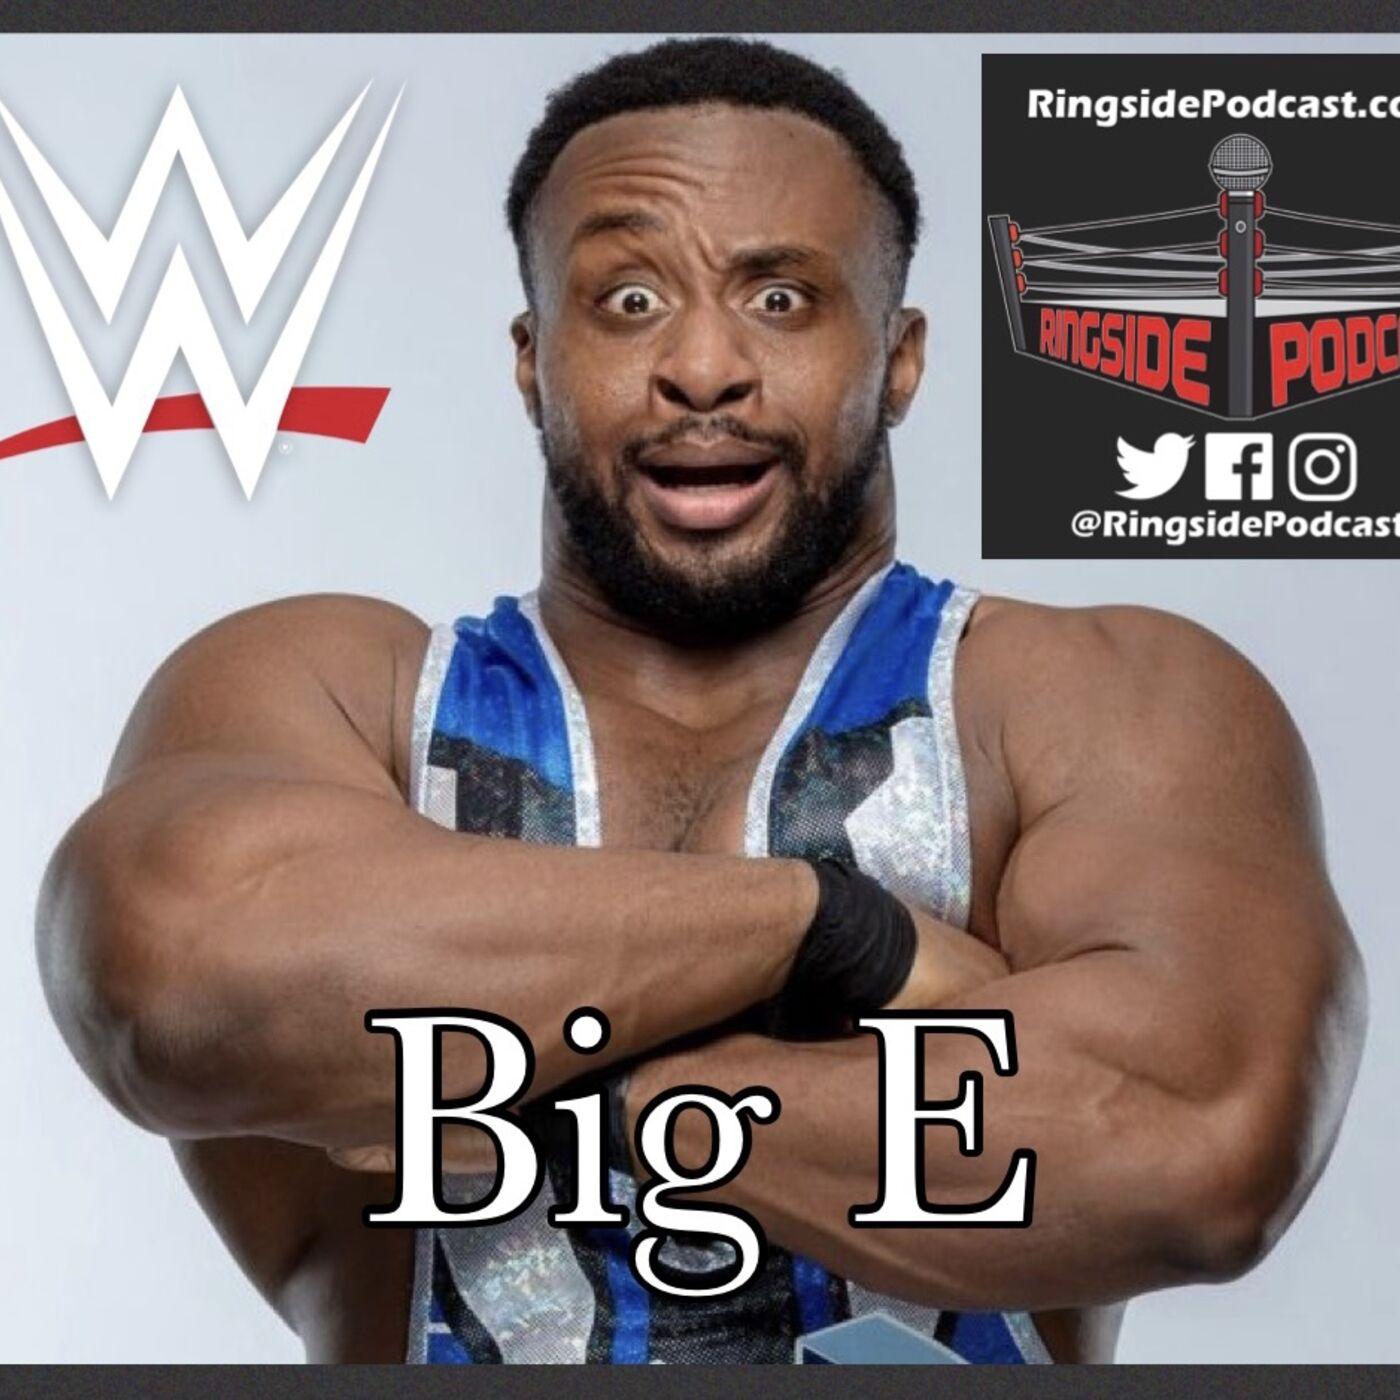 BONUS: WWE Superstar BIG E